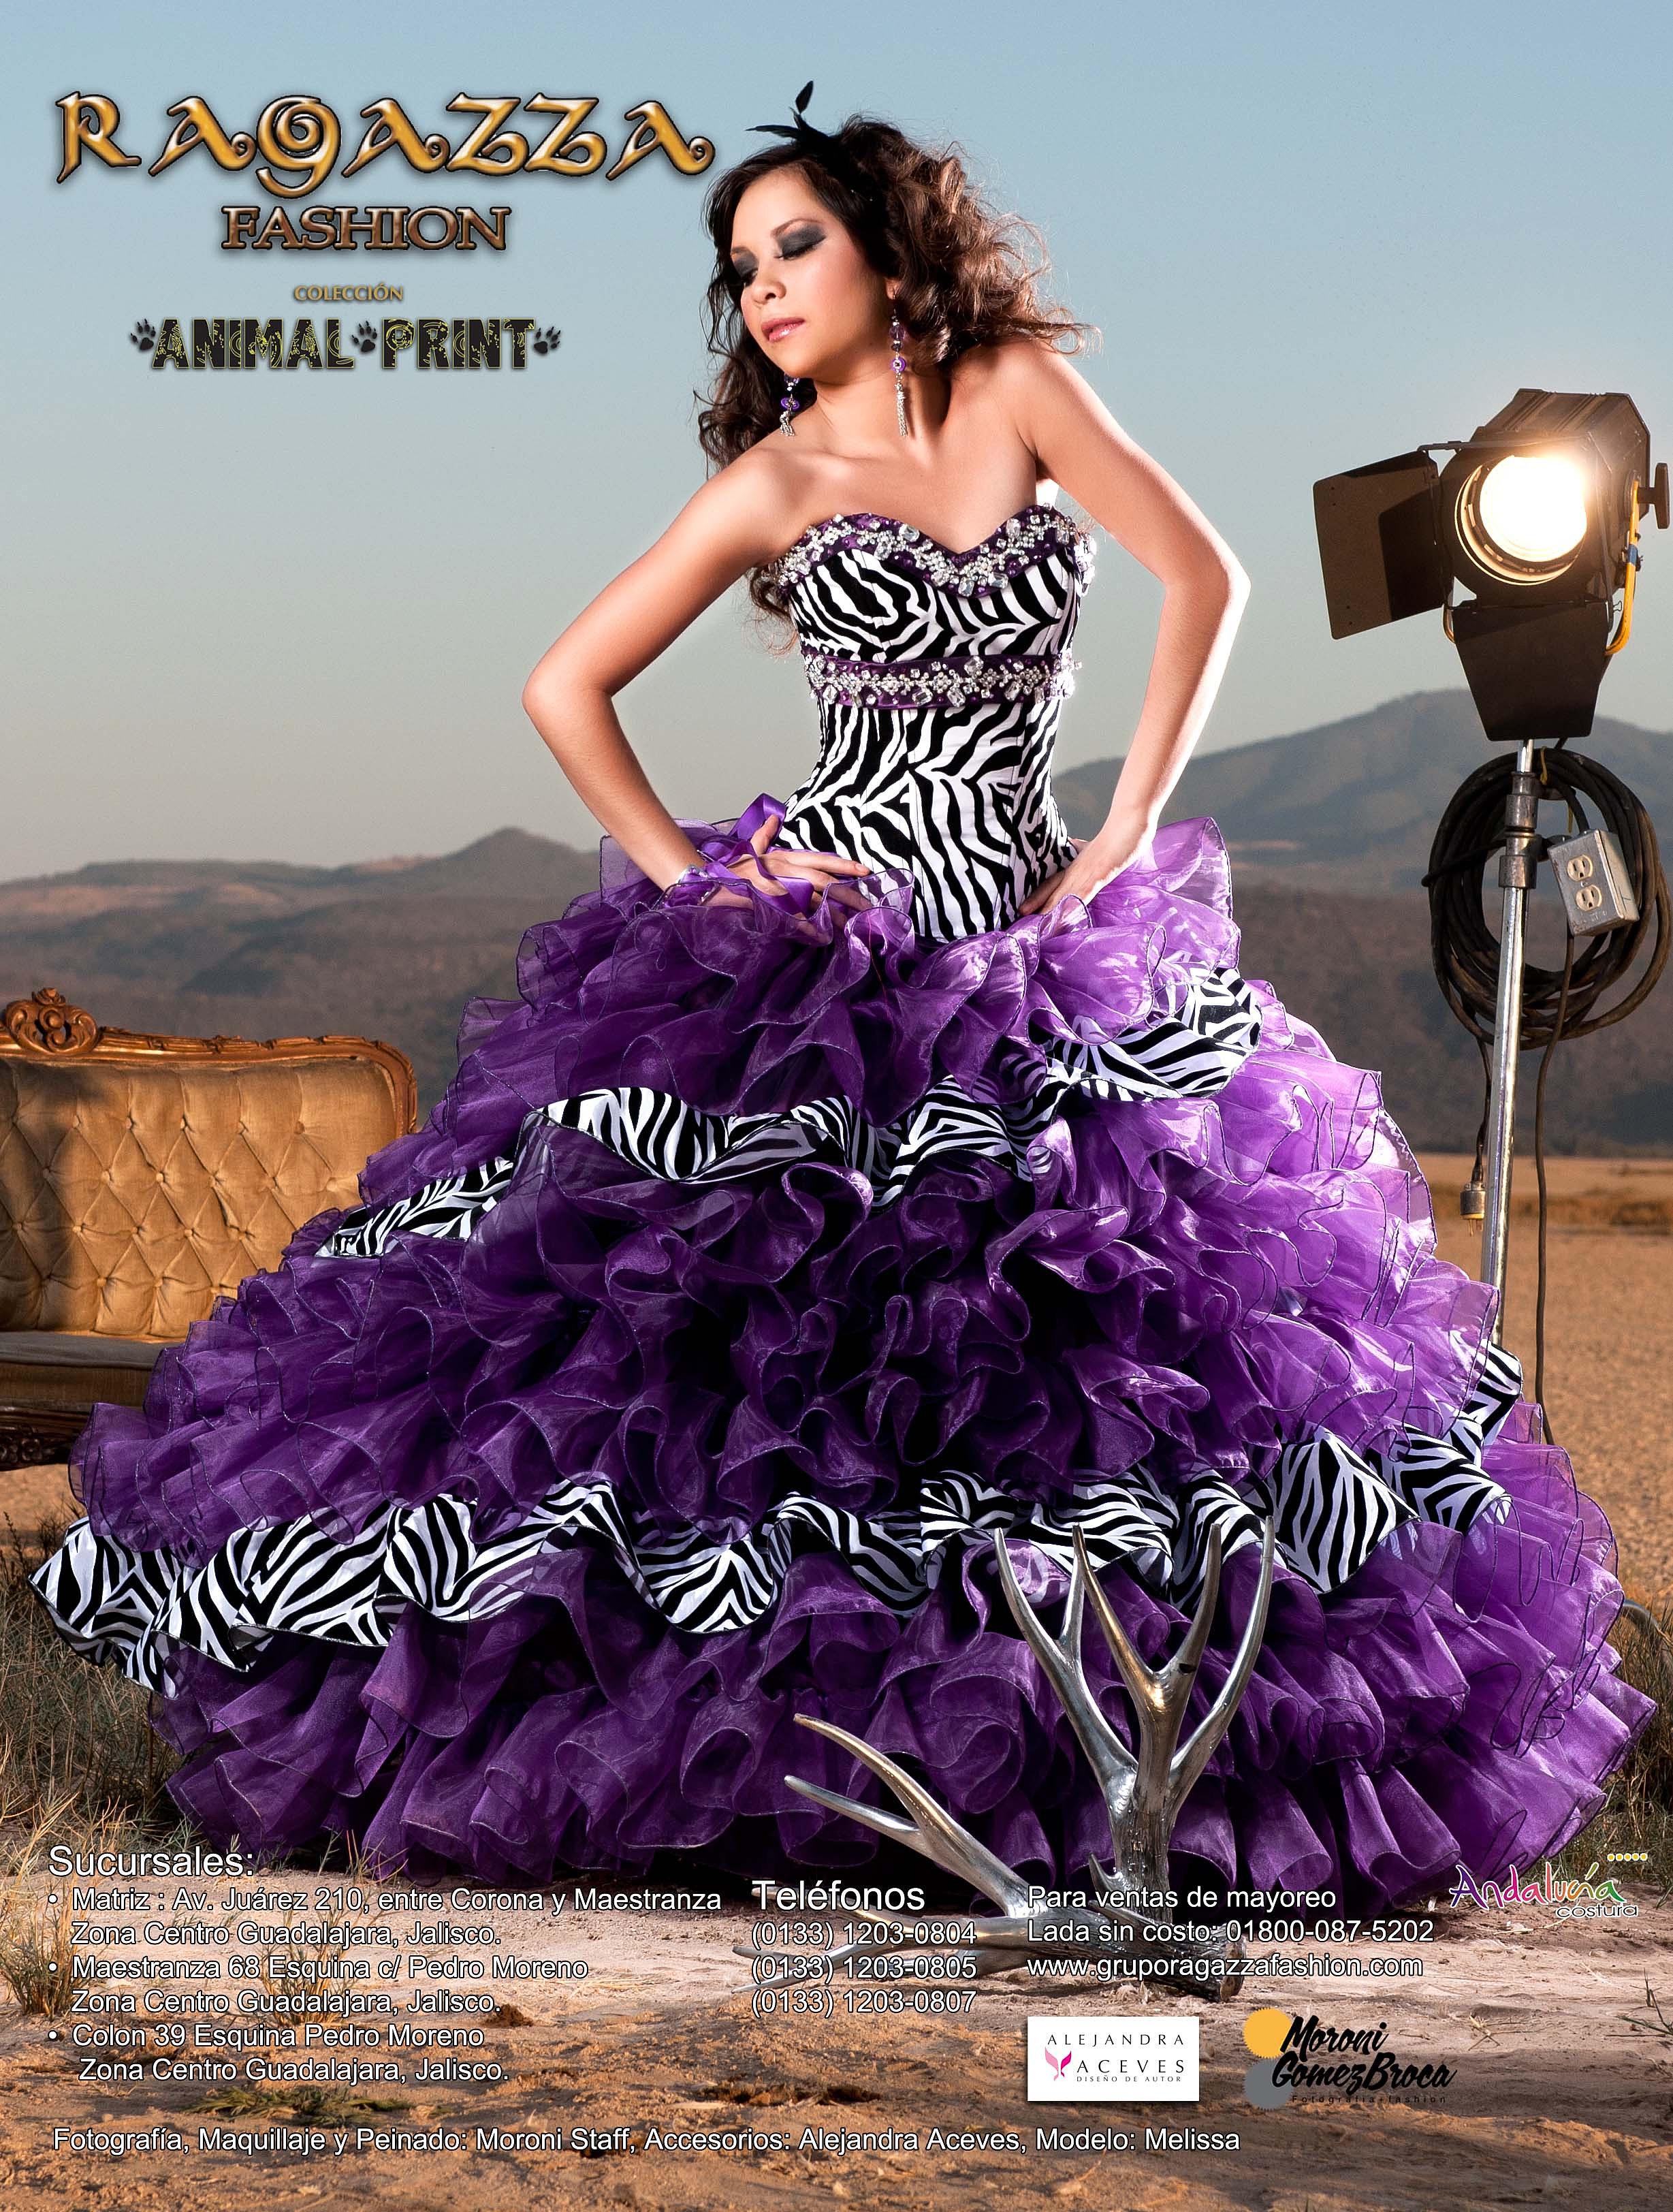 Style n70344 debutante dress - Style N70344 Debutante Dress Hillsinhollywood2014 Com Moroni Staff Fotografos En Guadalajara Coleccion Animal